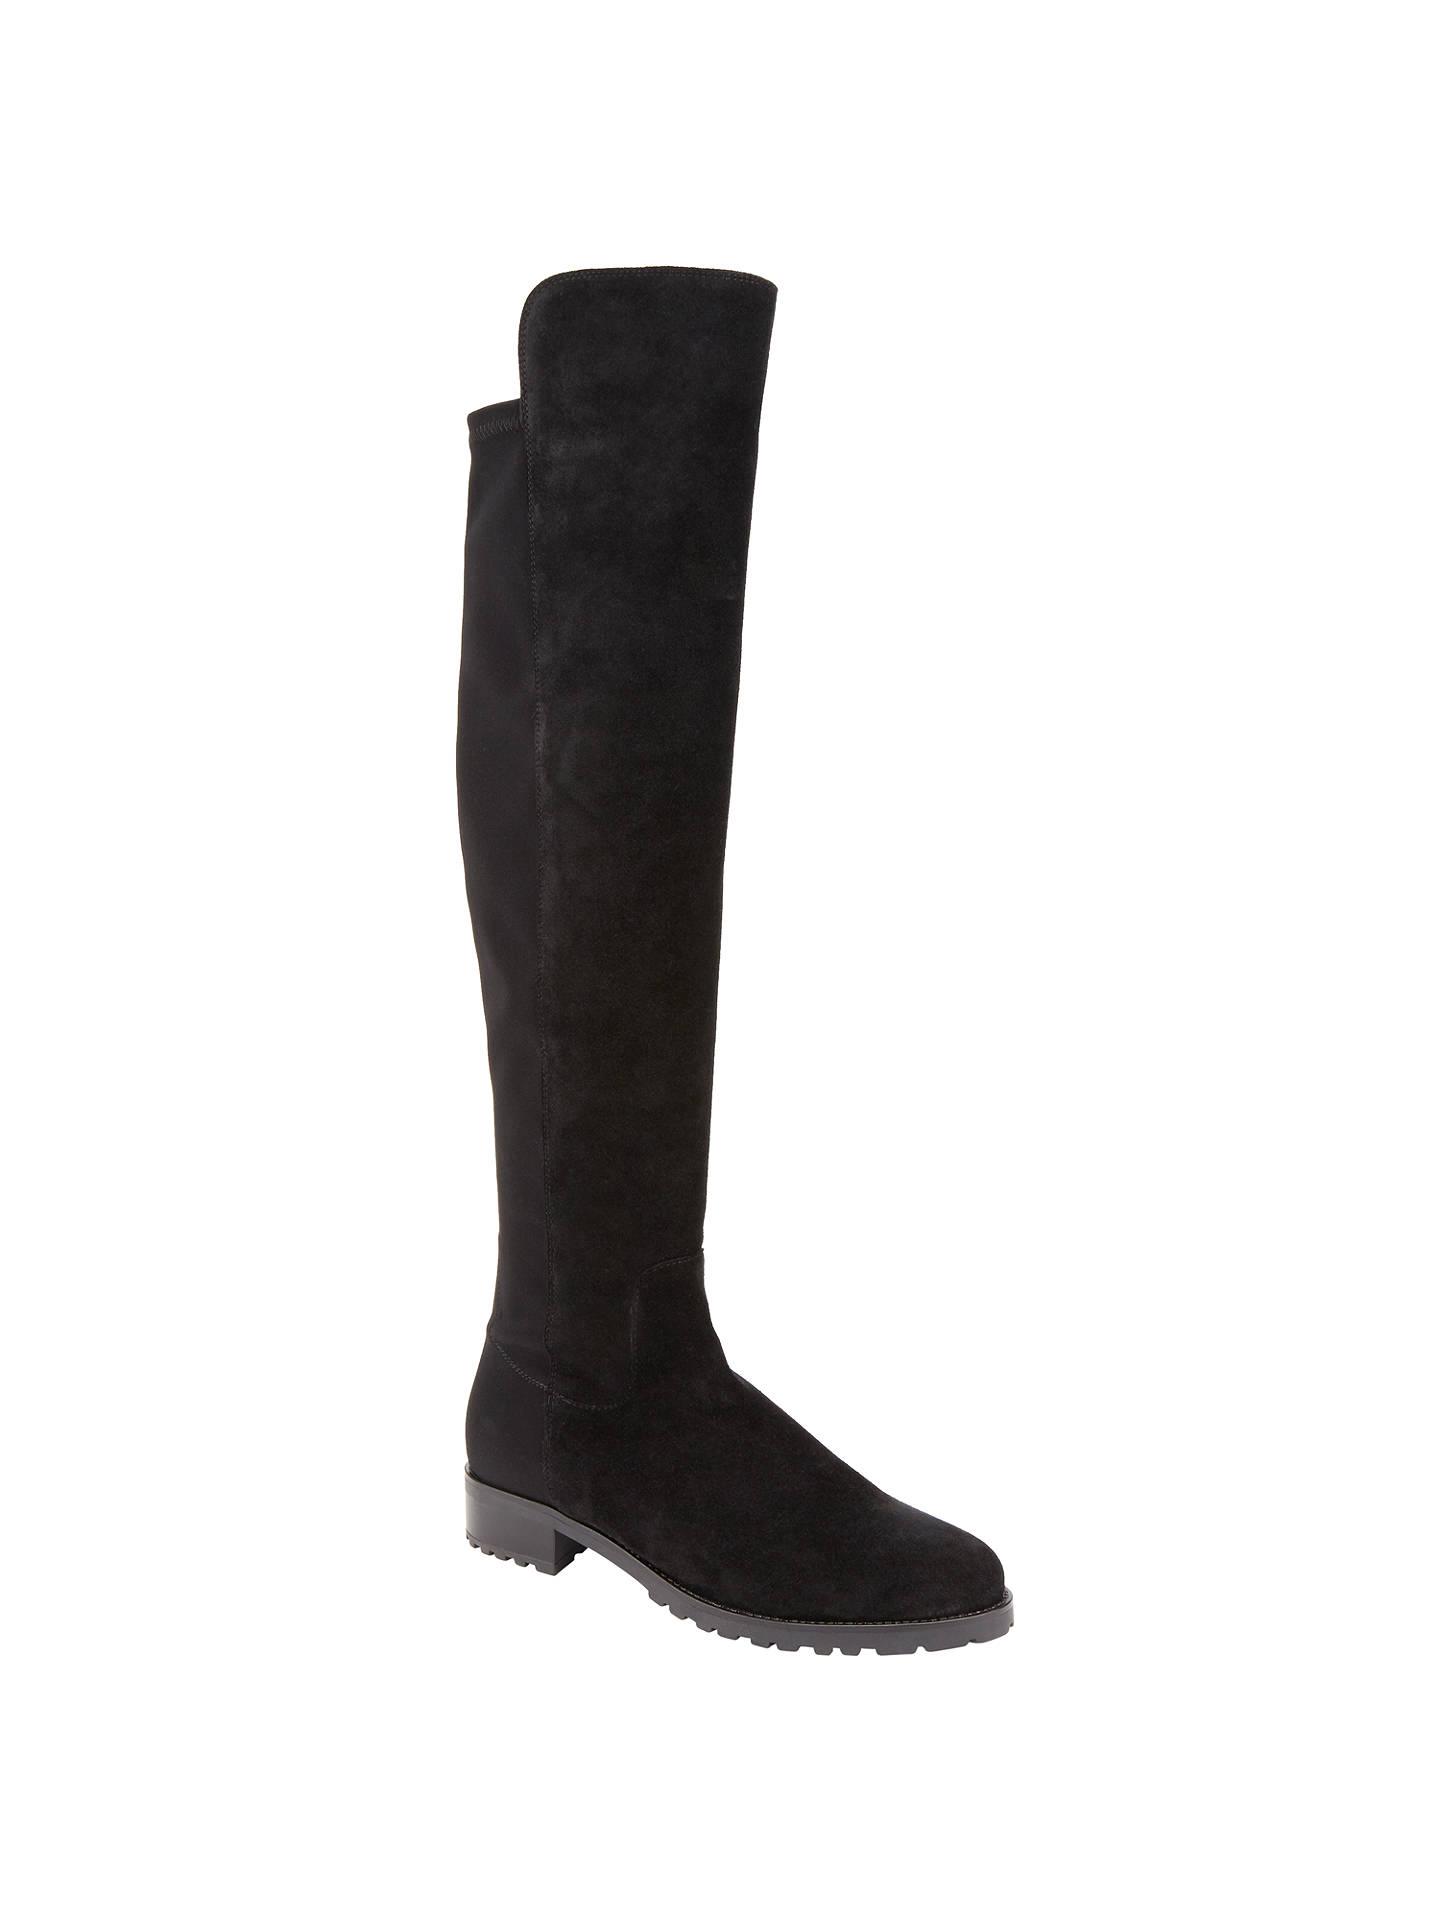 1821181ee Buy John Lewis Tilde Over the Knee Boots, Black Suede, 3 Online at  johnlewis ...